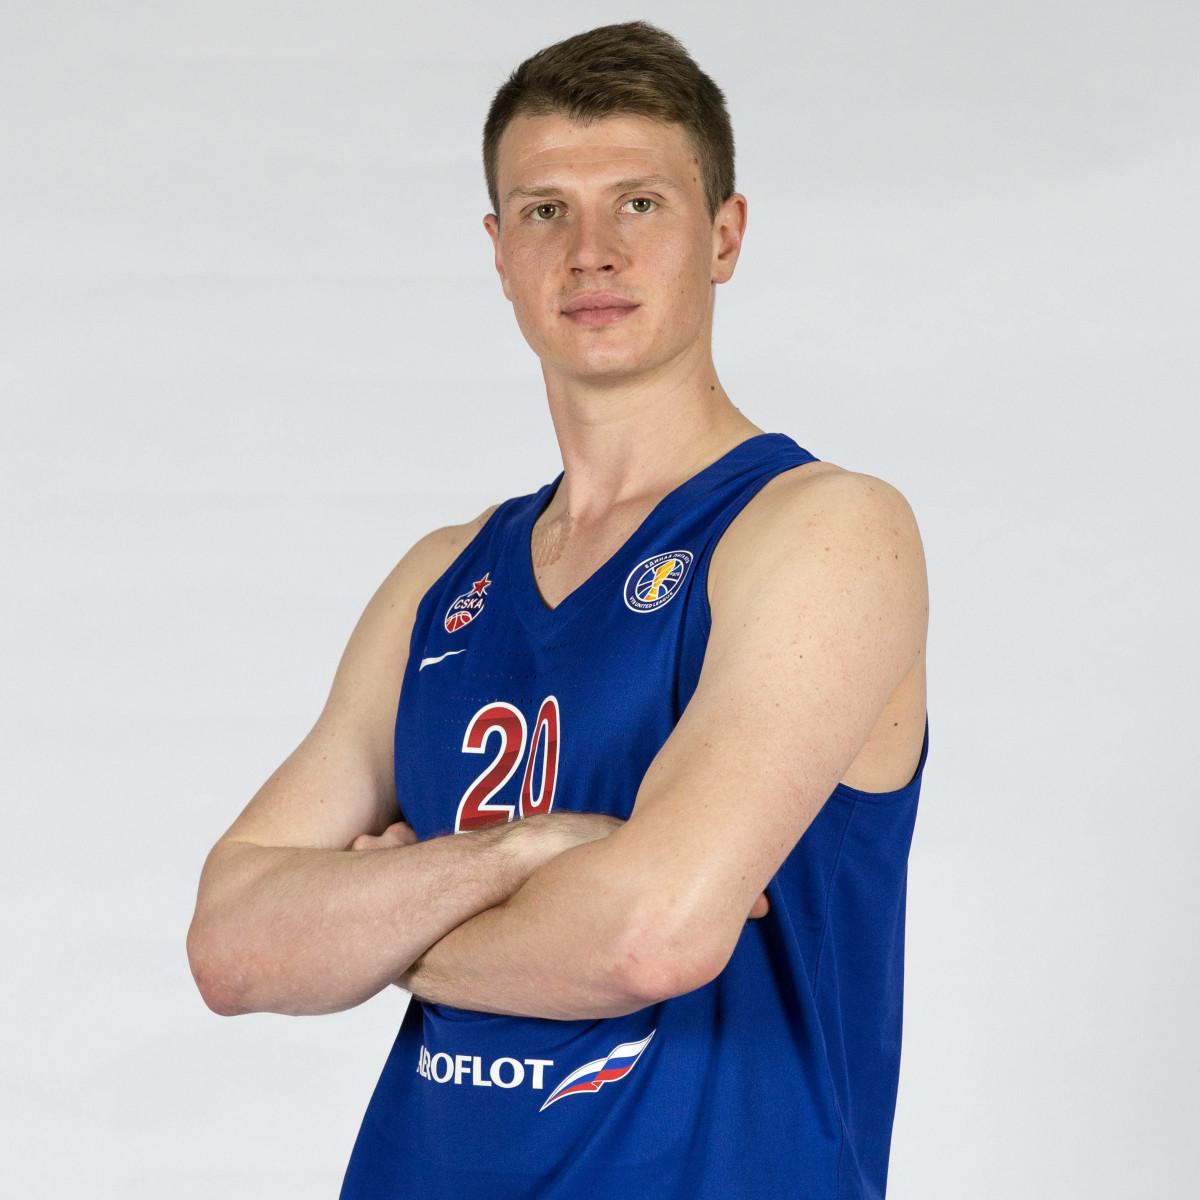 Photo of Andrei Vorontsevich, 2018-2019 season